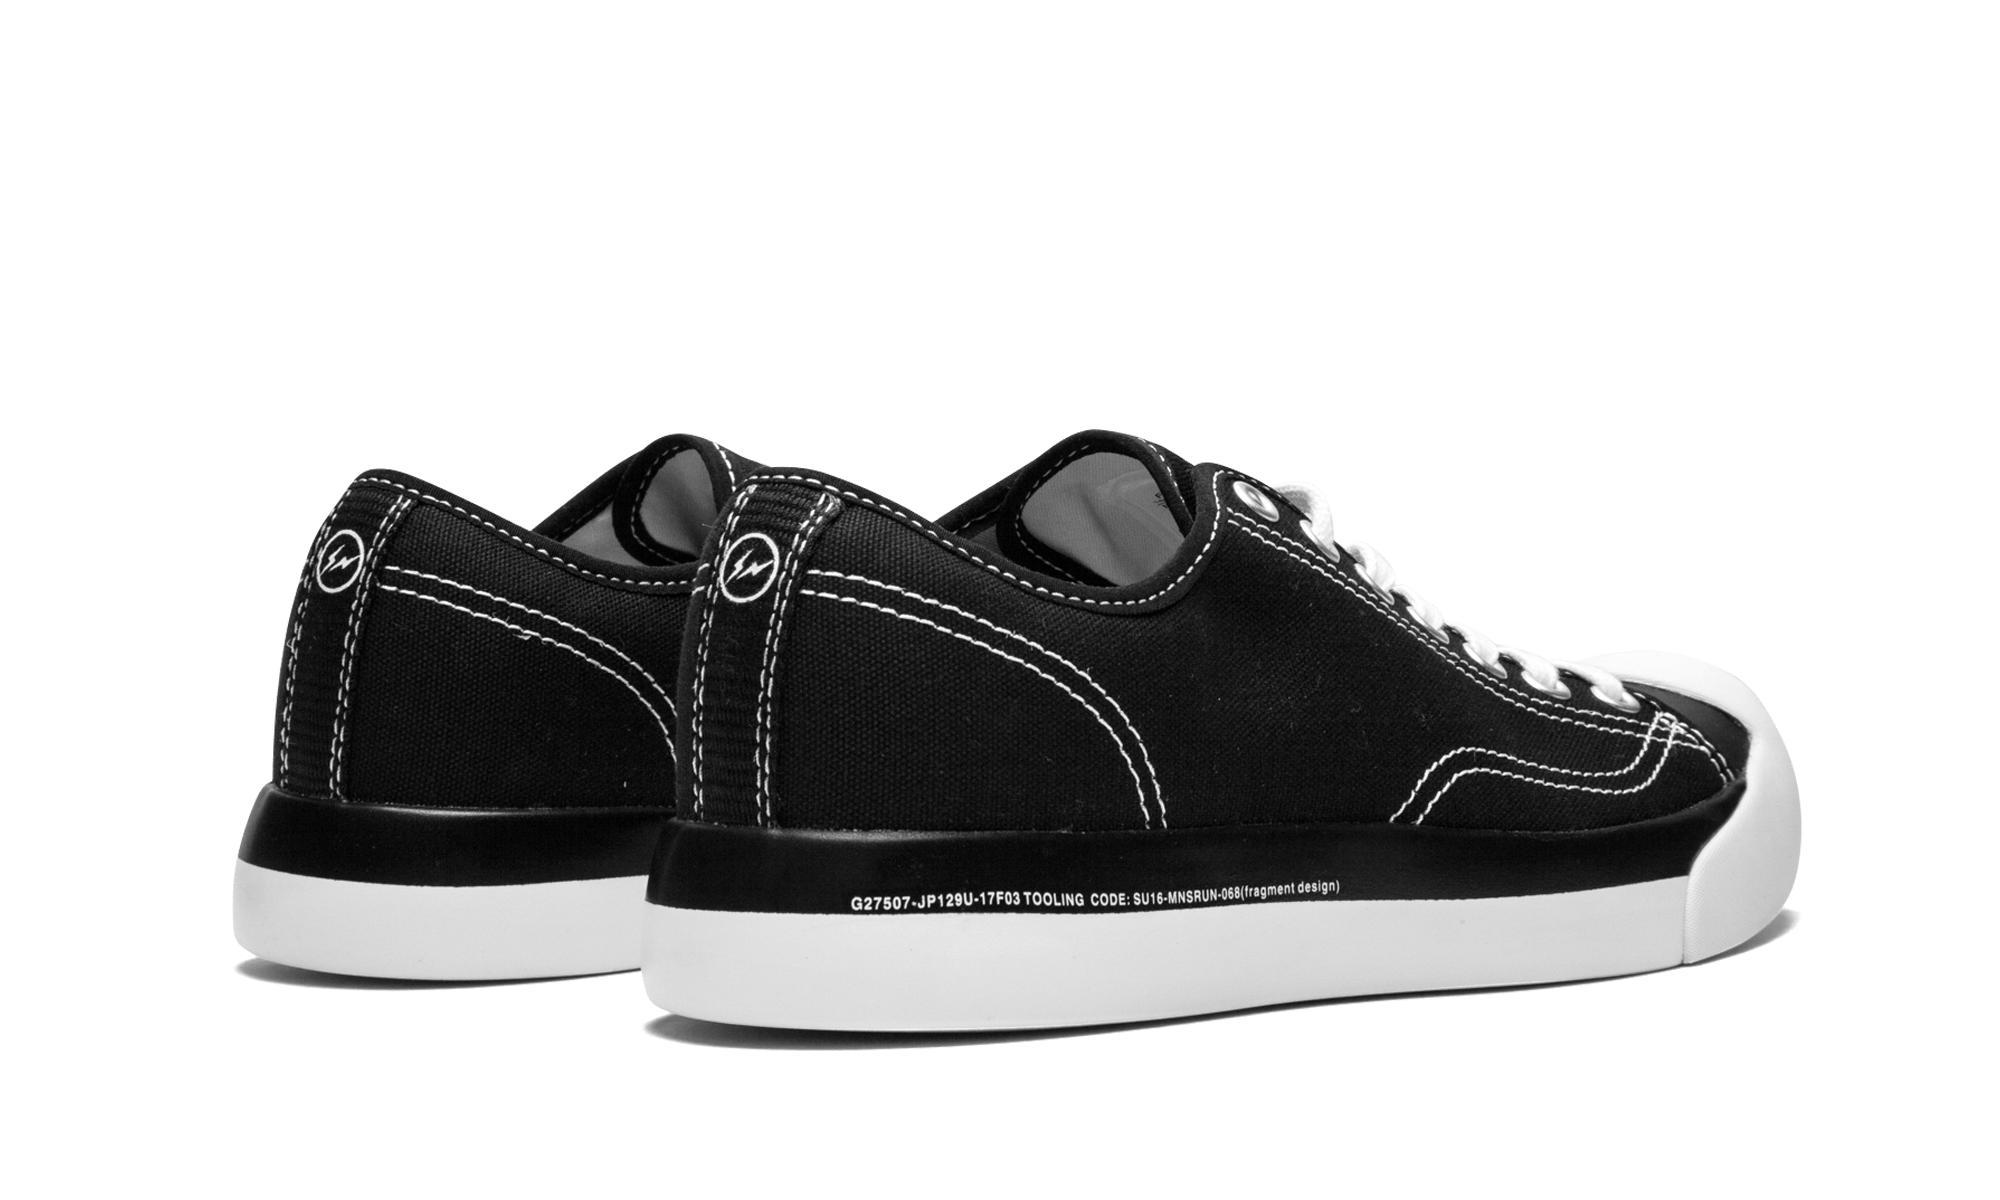 5e80510bcf46 Lyst - Converse Jp Modern Ox in Black for Men